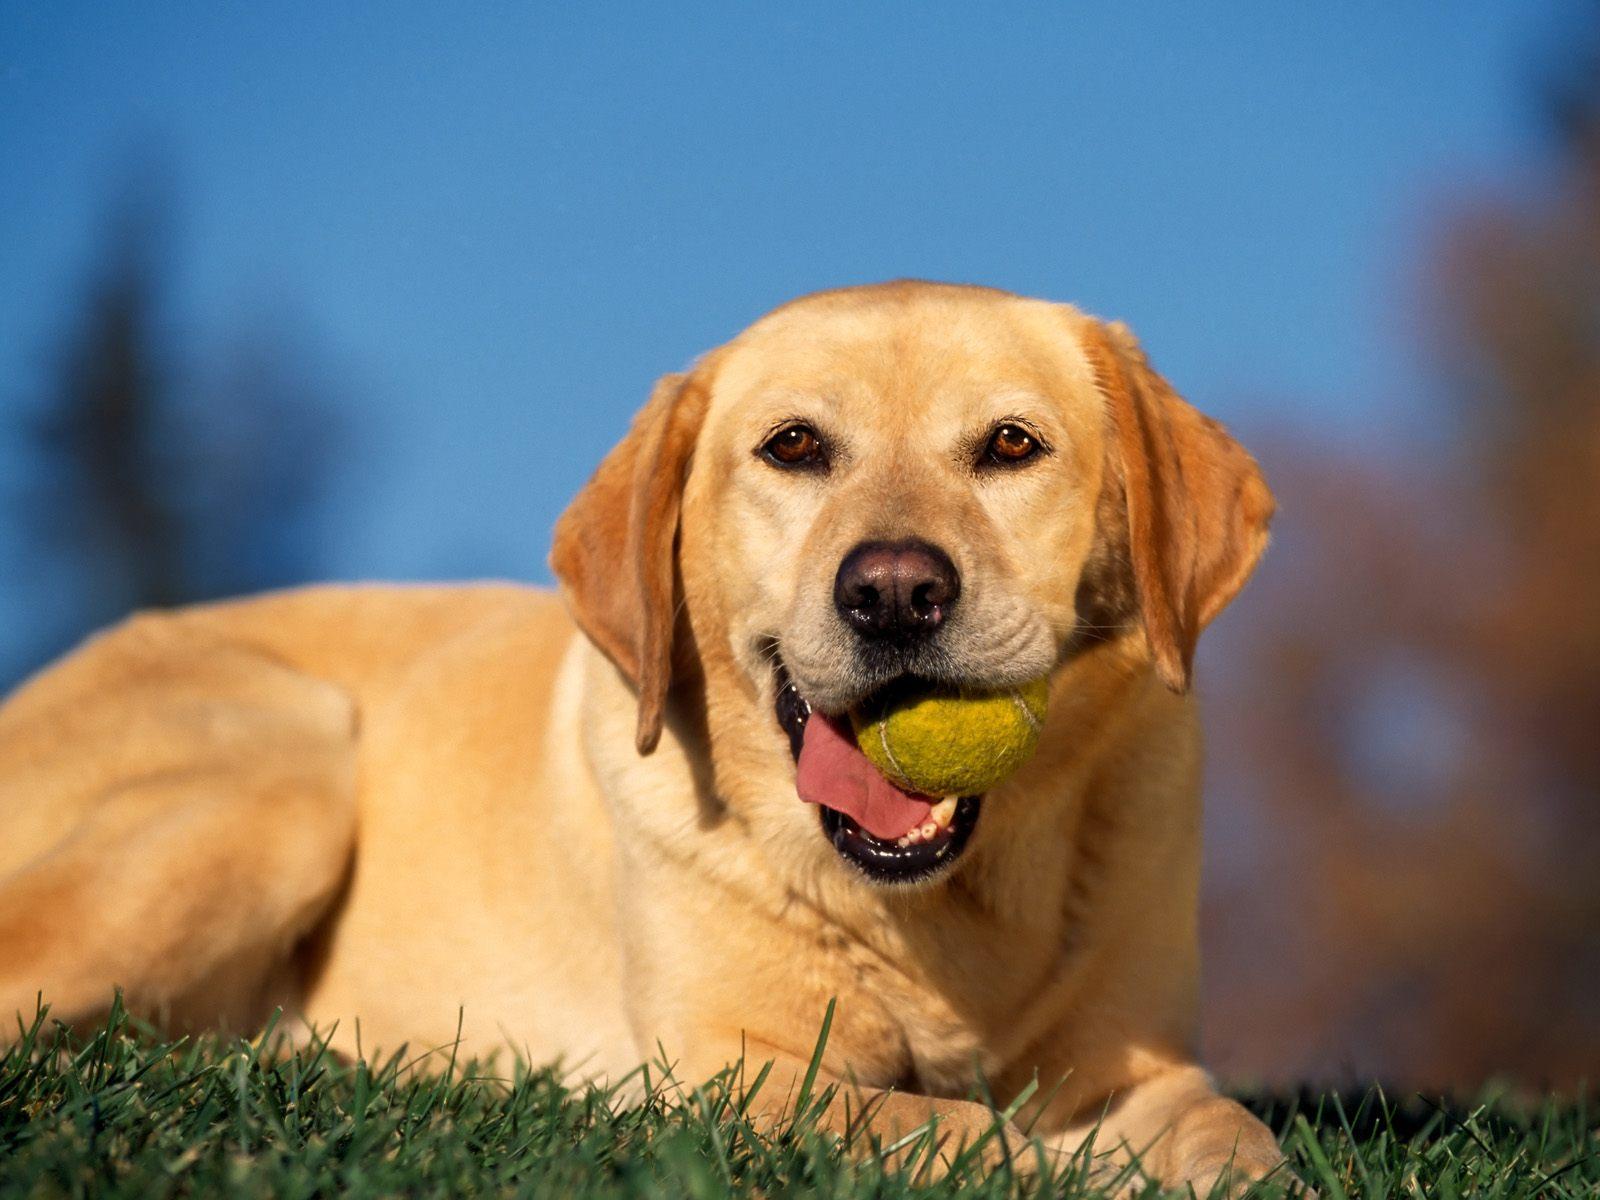 http://4.bp.blogspot.com/-gkiOaHKoE4U/TjQhnrHbjMI/AAAAAAAAAD4/RYJpVemslgs/s1600/Break+Time%252C+Yellow+Labrador.jpg